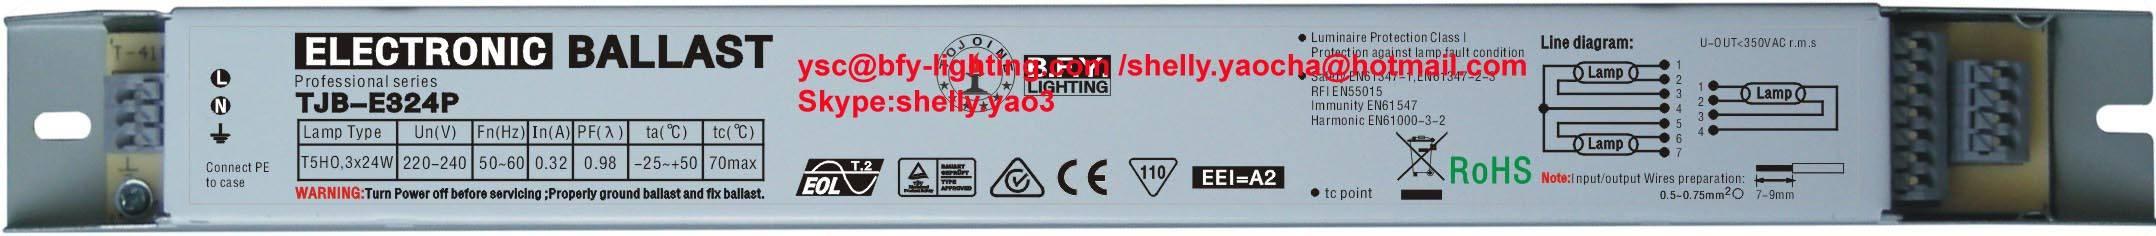 electronic ballast 14w